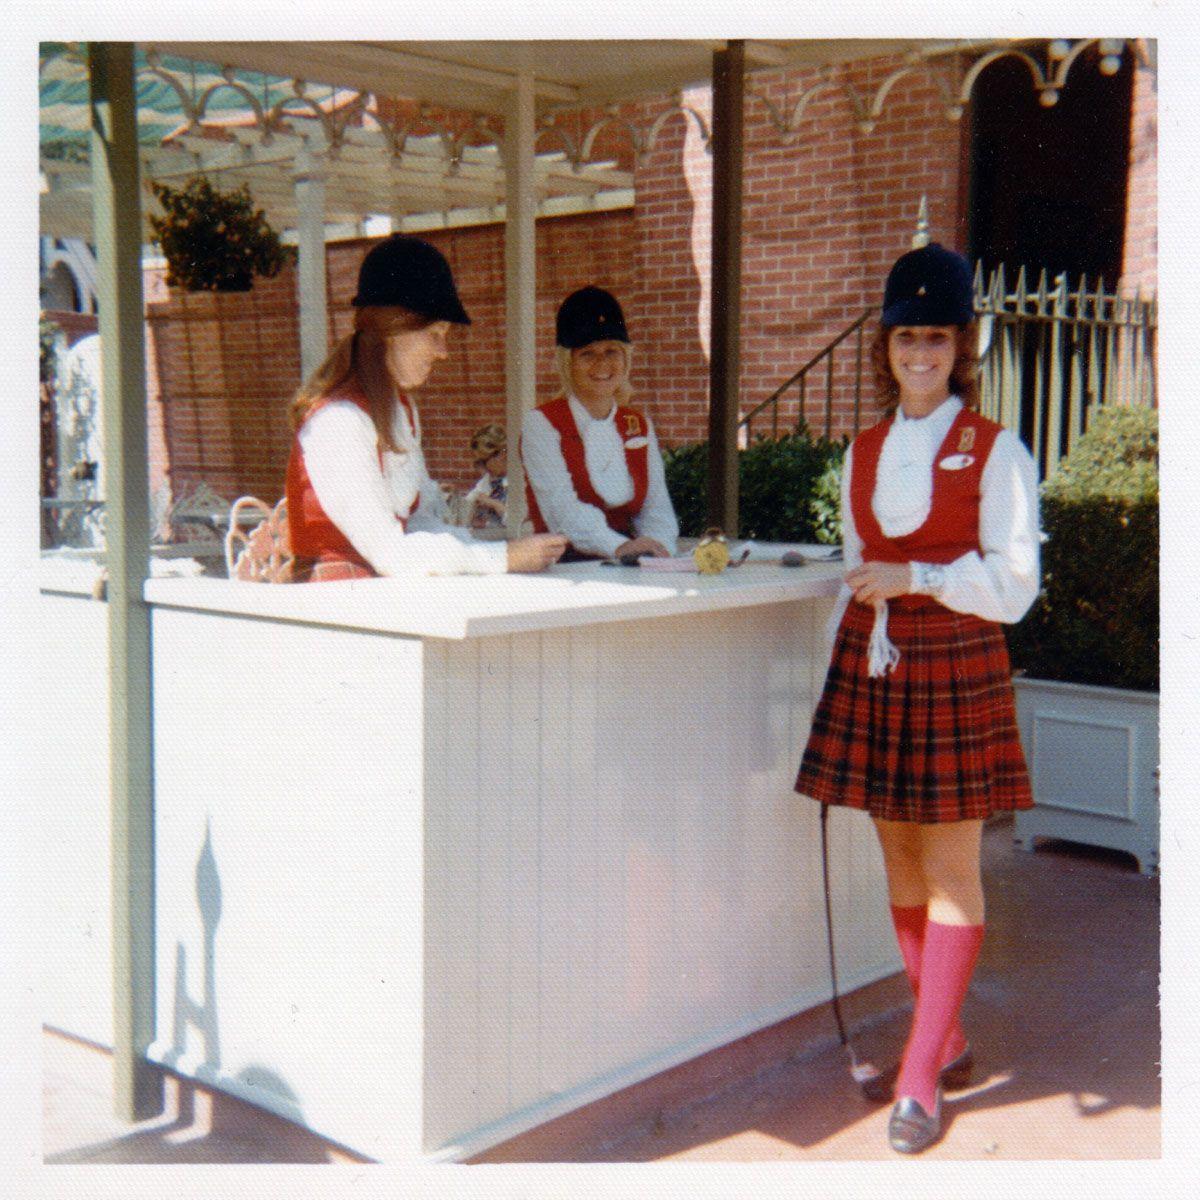 Disneyland tour guides in the 1970s Retro disney